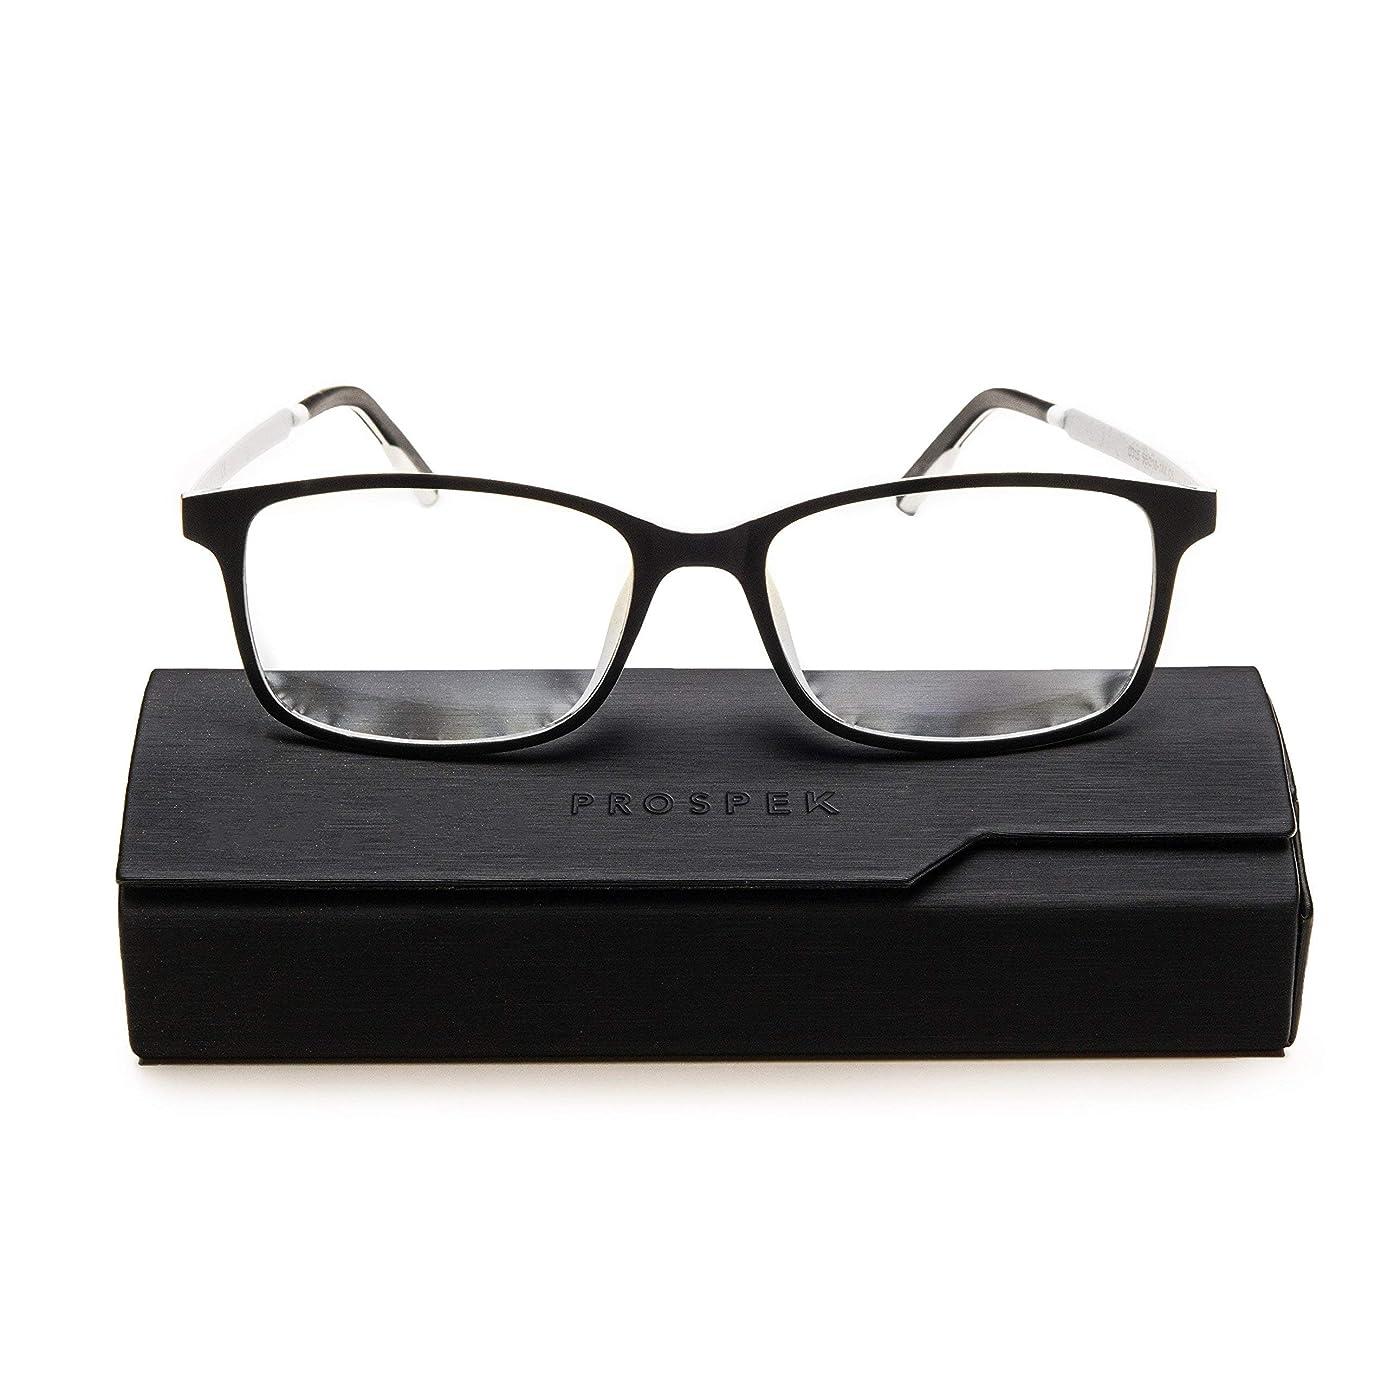 PROSPEK Computer Glasses - Blue Light Blocking Glasses - Arctic (+1.00 Magnification)